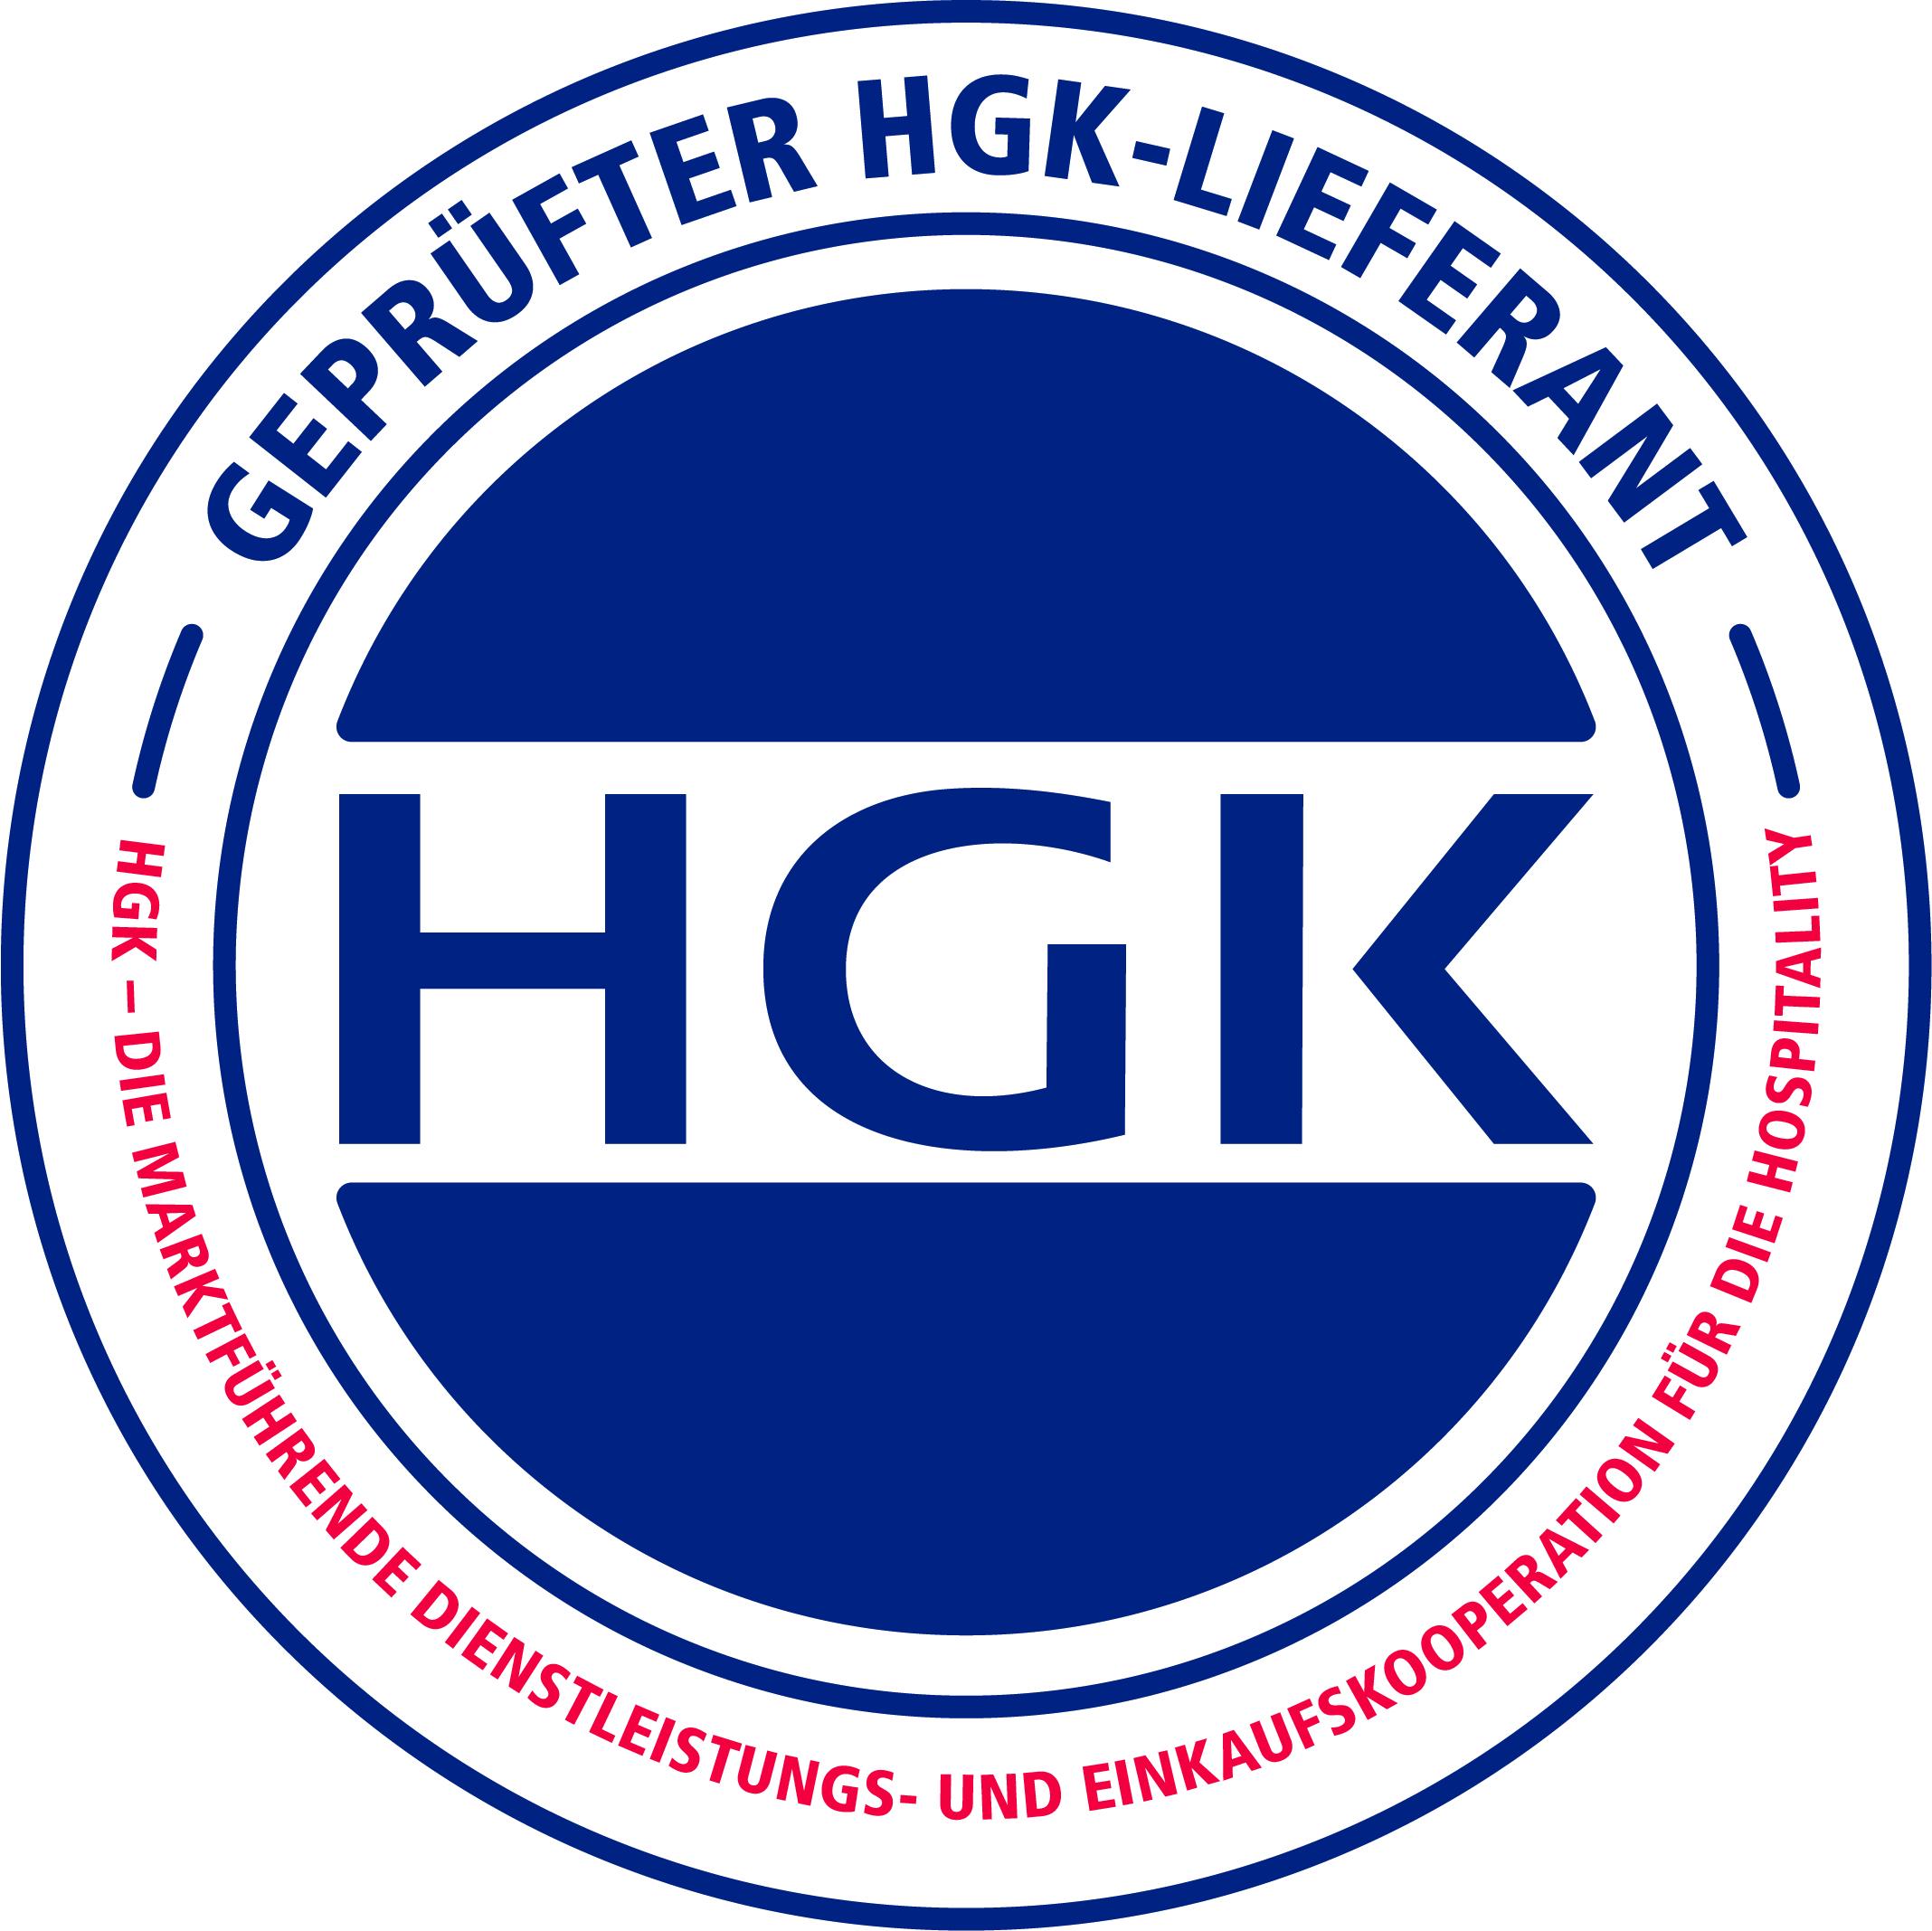 HGK_Qualitaetssiegel_CD_neu_blau.jpg